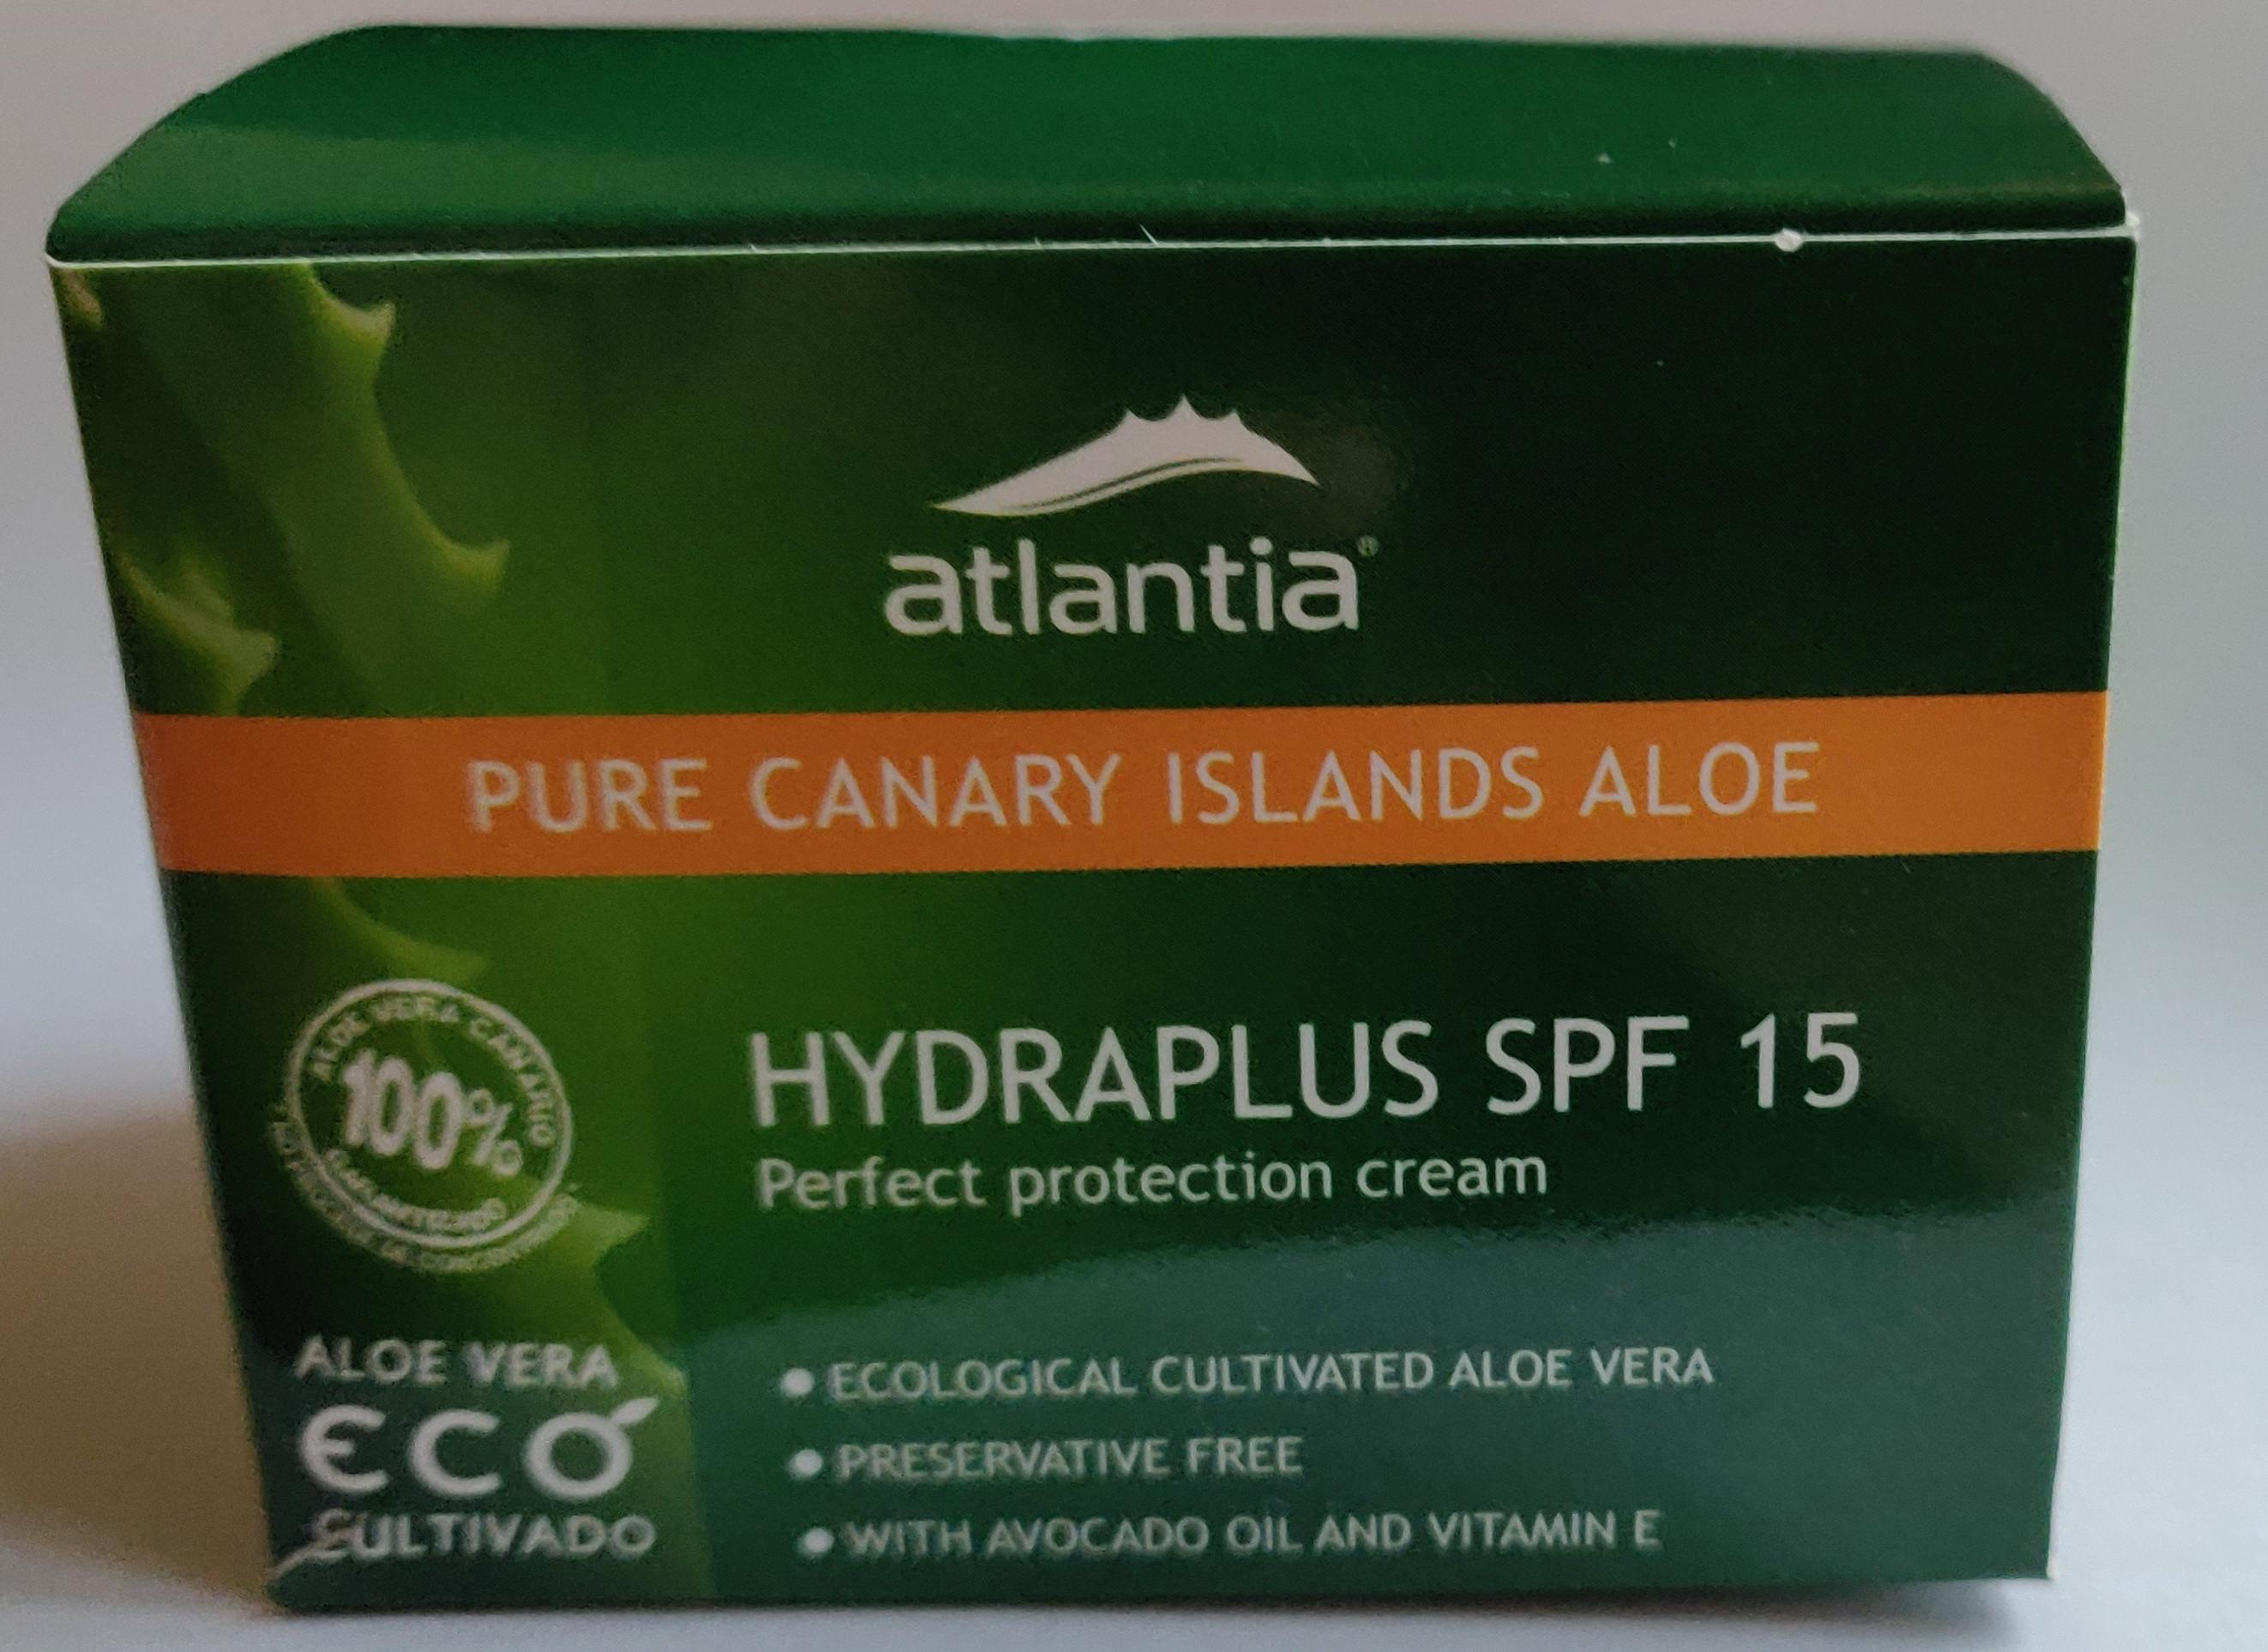 Atlantia Hydraplus Spf 15 Perfect Protection Cream